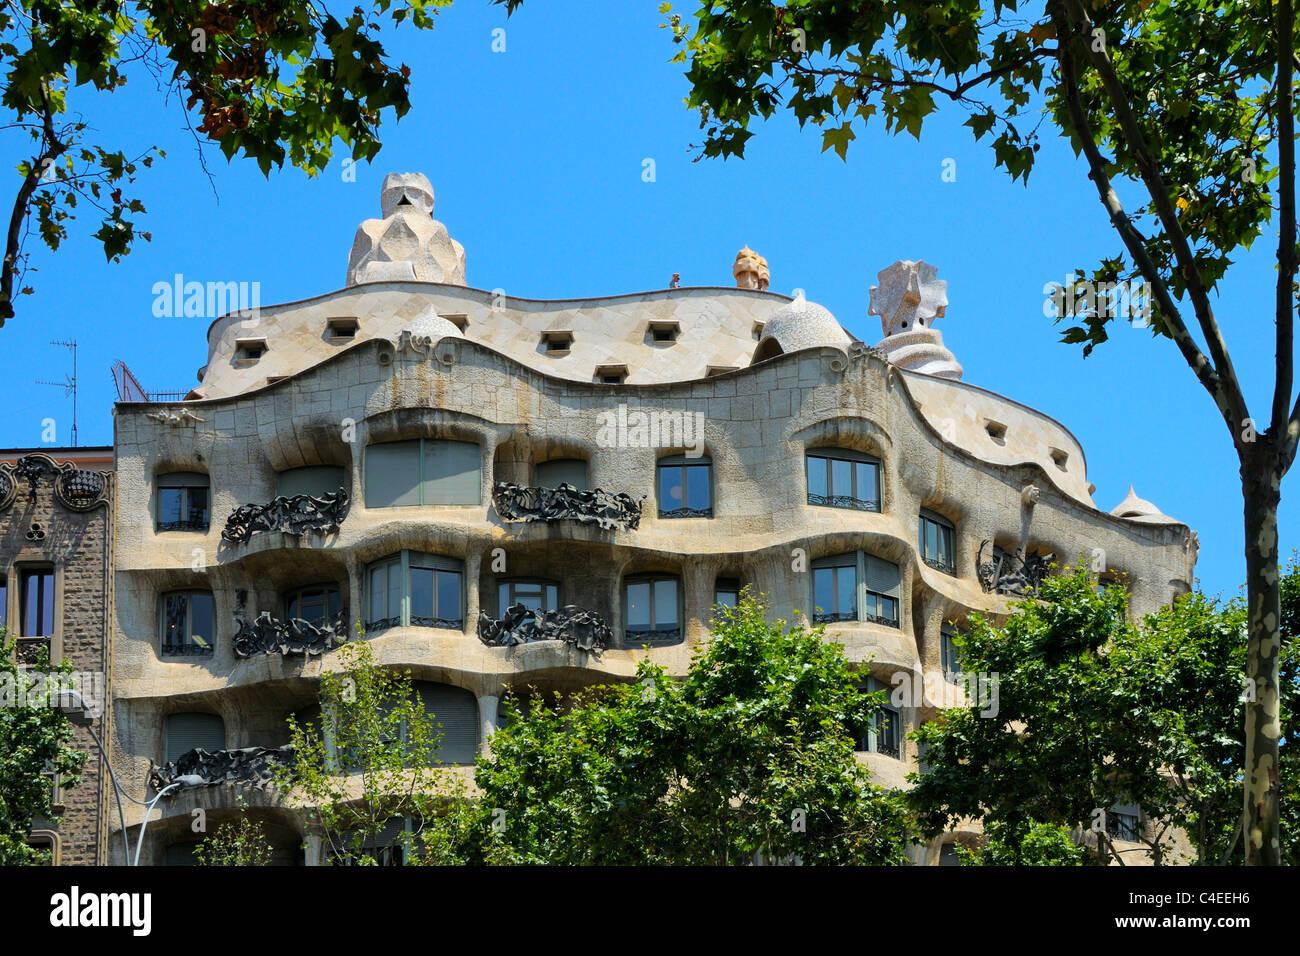 The famous Casa Mila, build in 1910 by architect Antoni Gaudi, located on Passeig de Gracia, Barcelona, Spain. - Stock Image